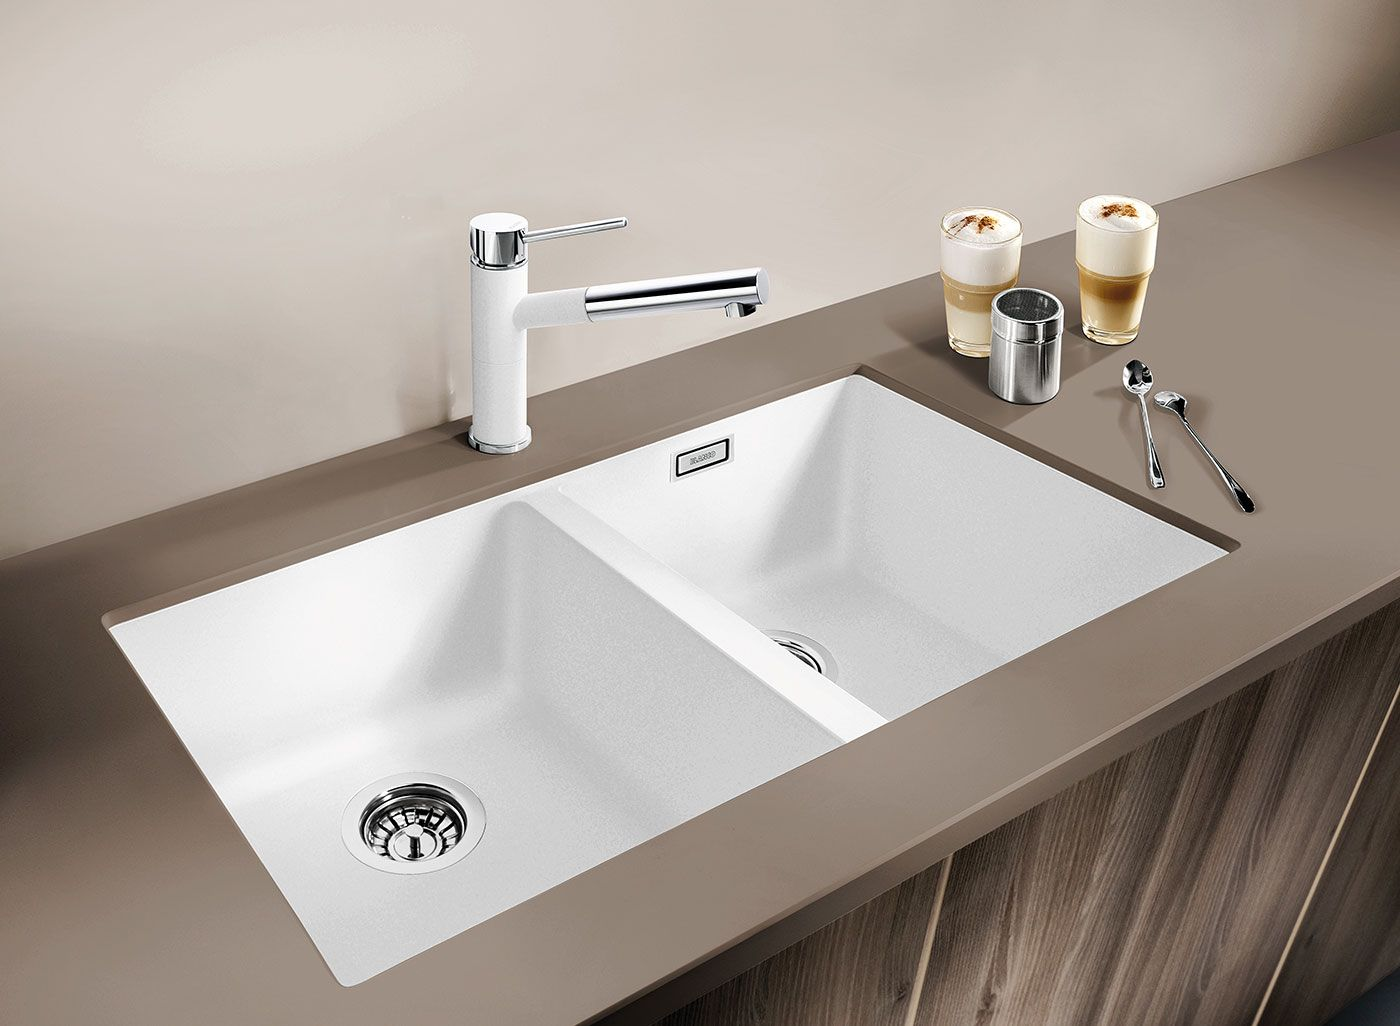 White Porcelain Undermount Sink Double Bowl Stainless Steel Sink Undermou White Undermount Kitchen Sink Undermount Kitchen Sinks Undermount Double Kitchen Sink